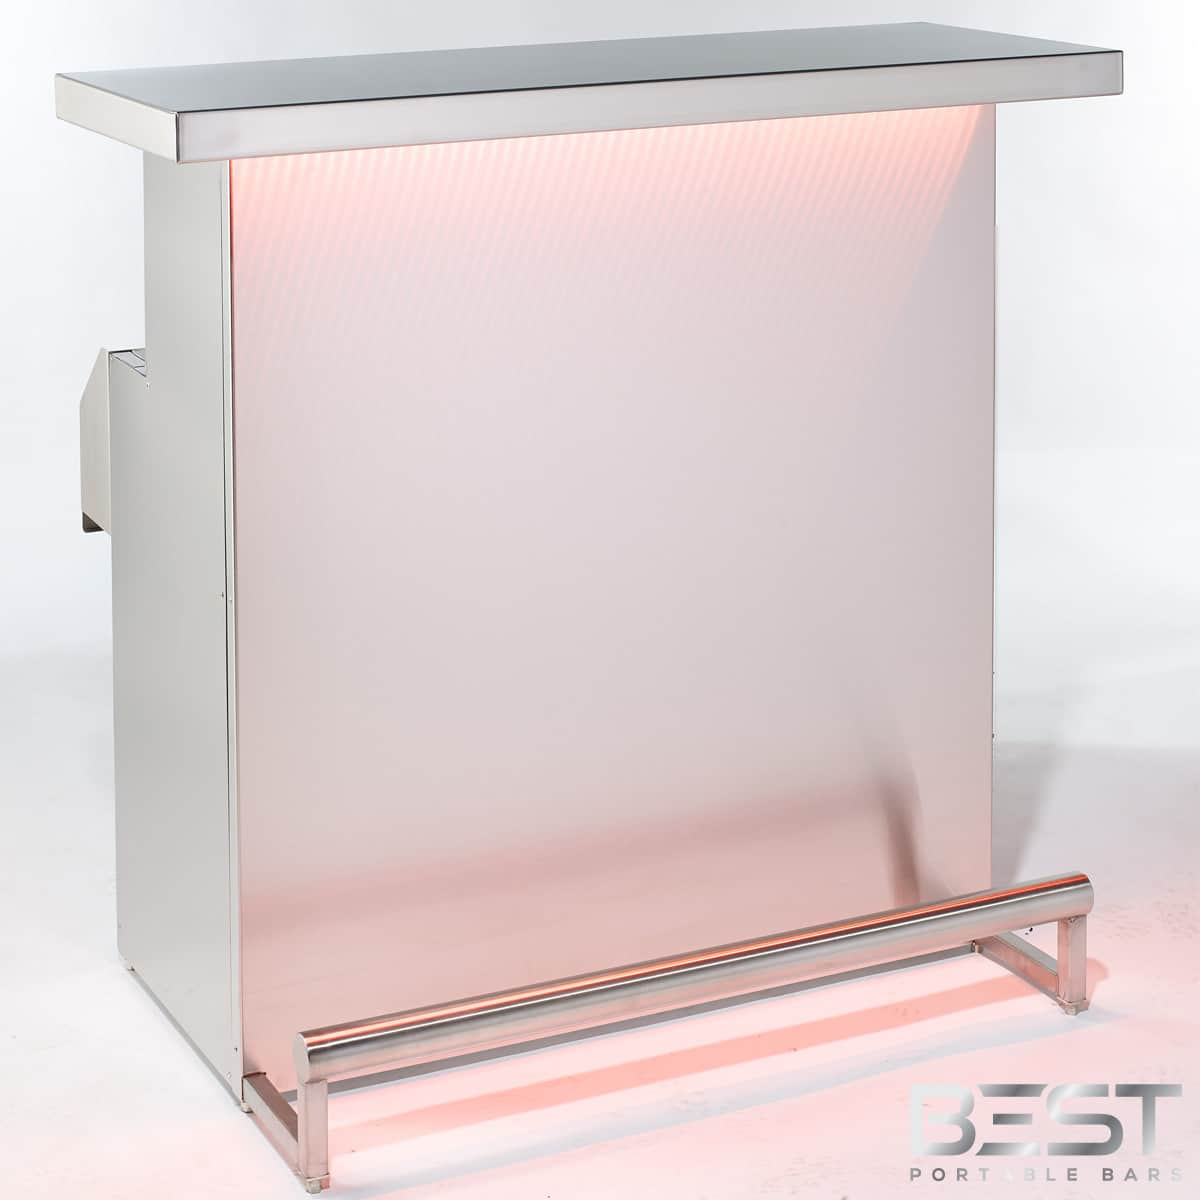 DELUX-Bar-1200-Light-Red